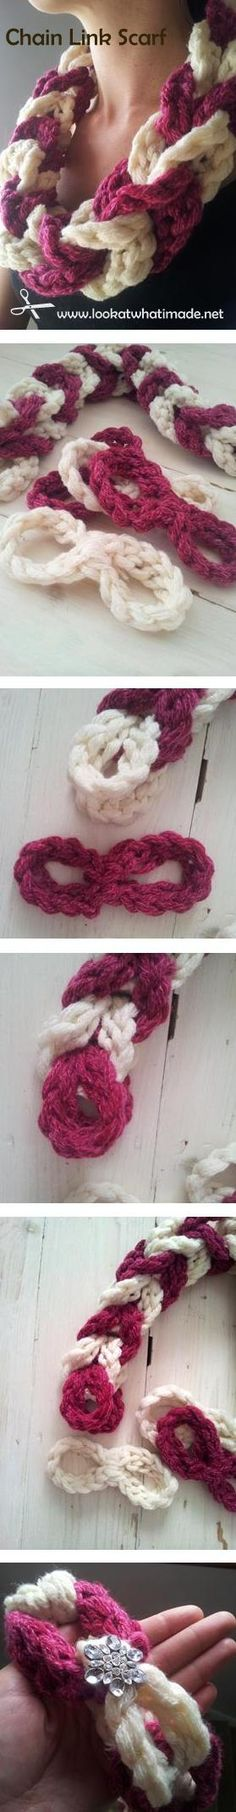 Crochet Chain Link Scarf Crochet Chain Link Scarf Pattern